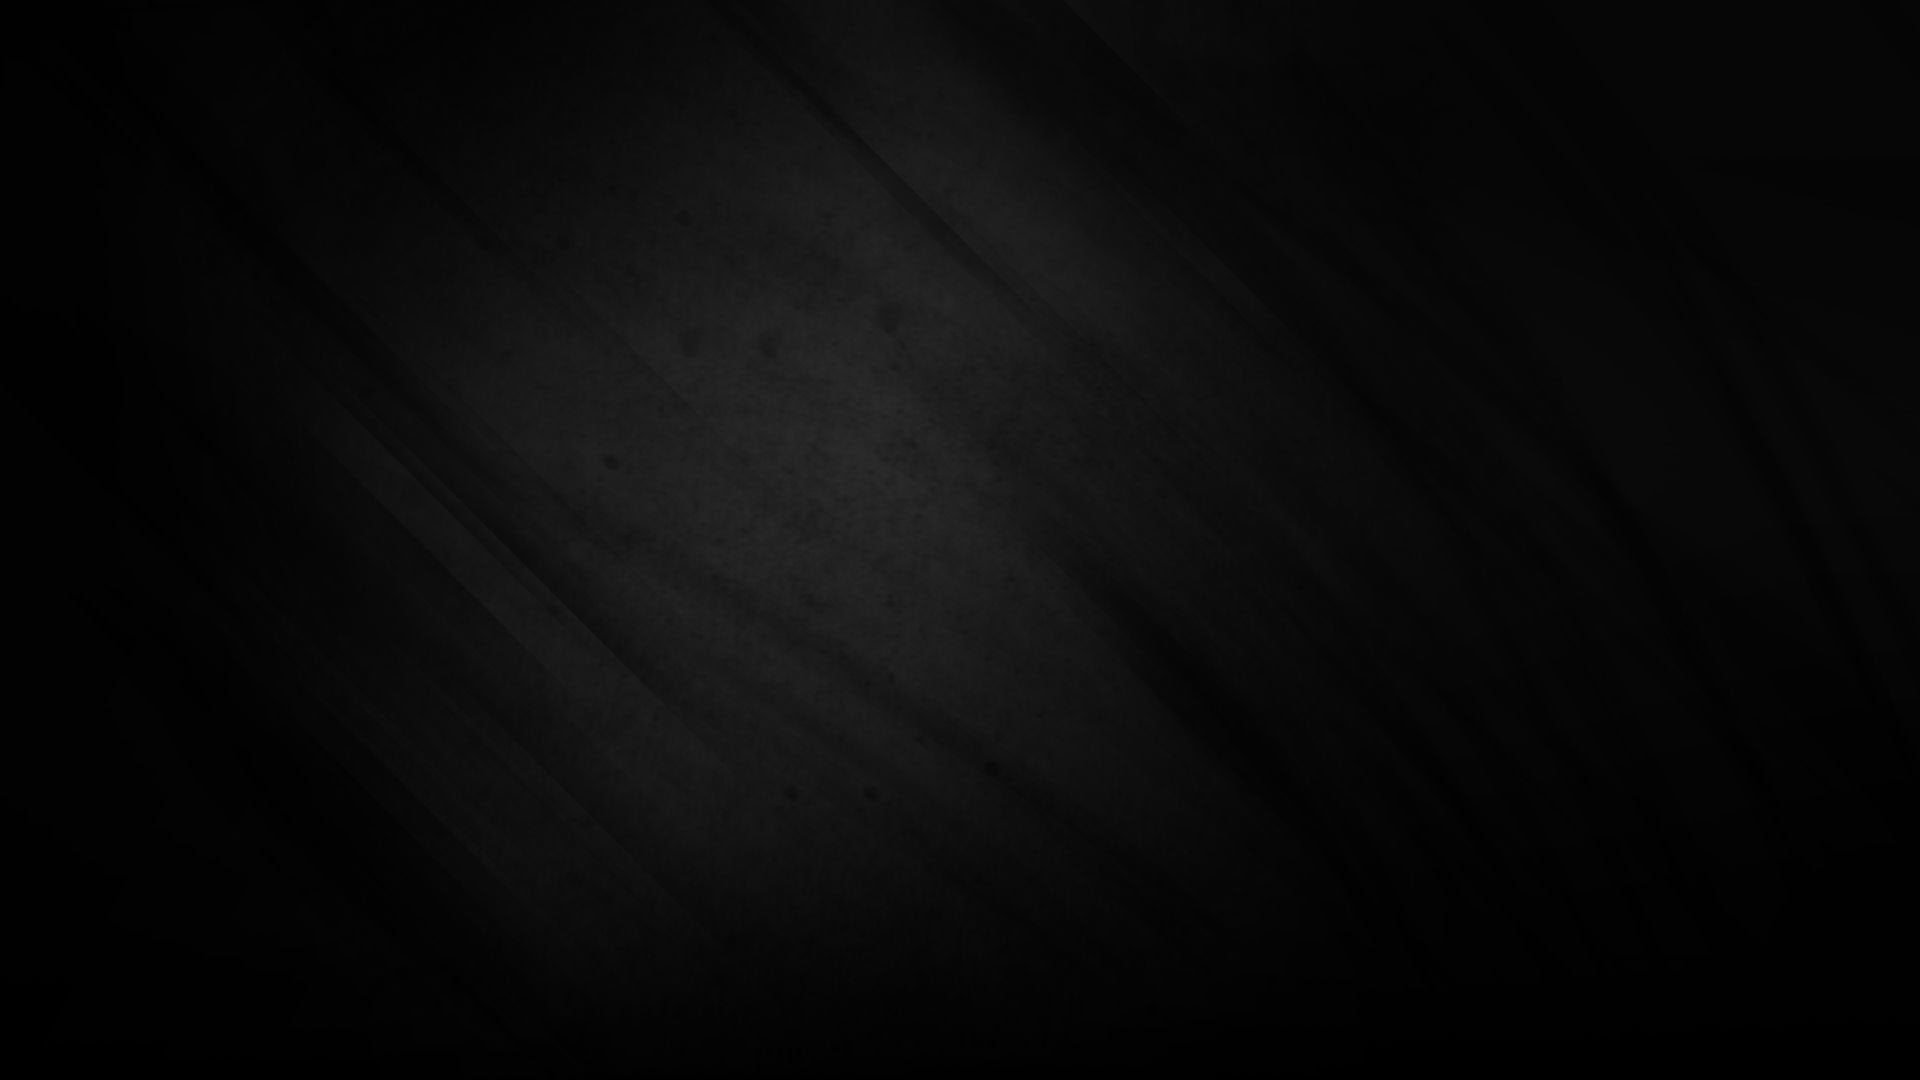 Dark Black Hd Background Artistic Joyful